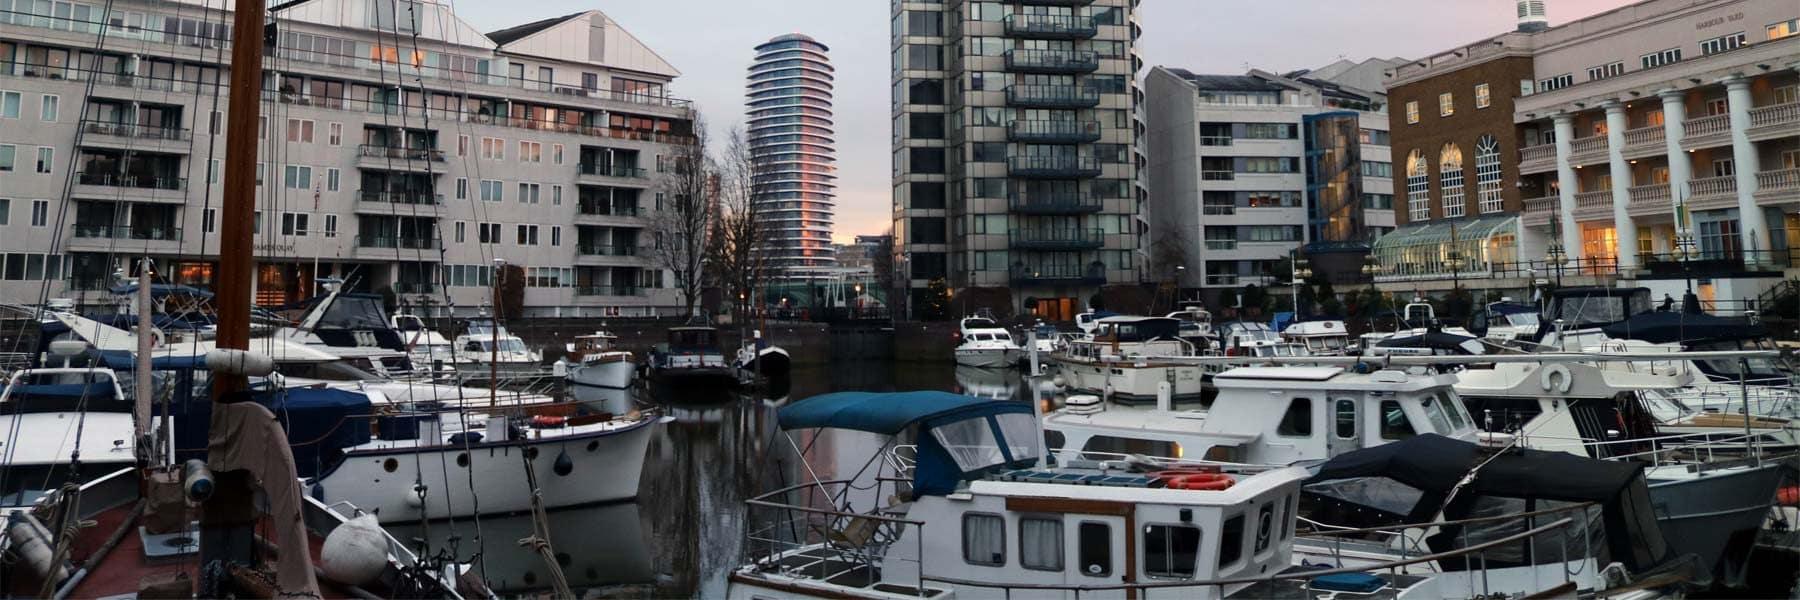 Chelsea Harbour Marina